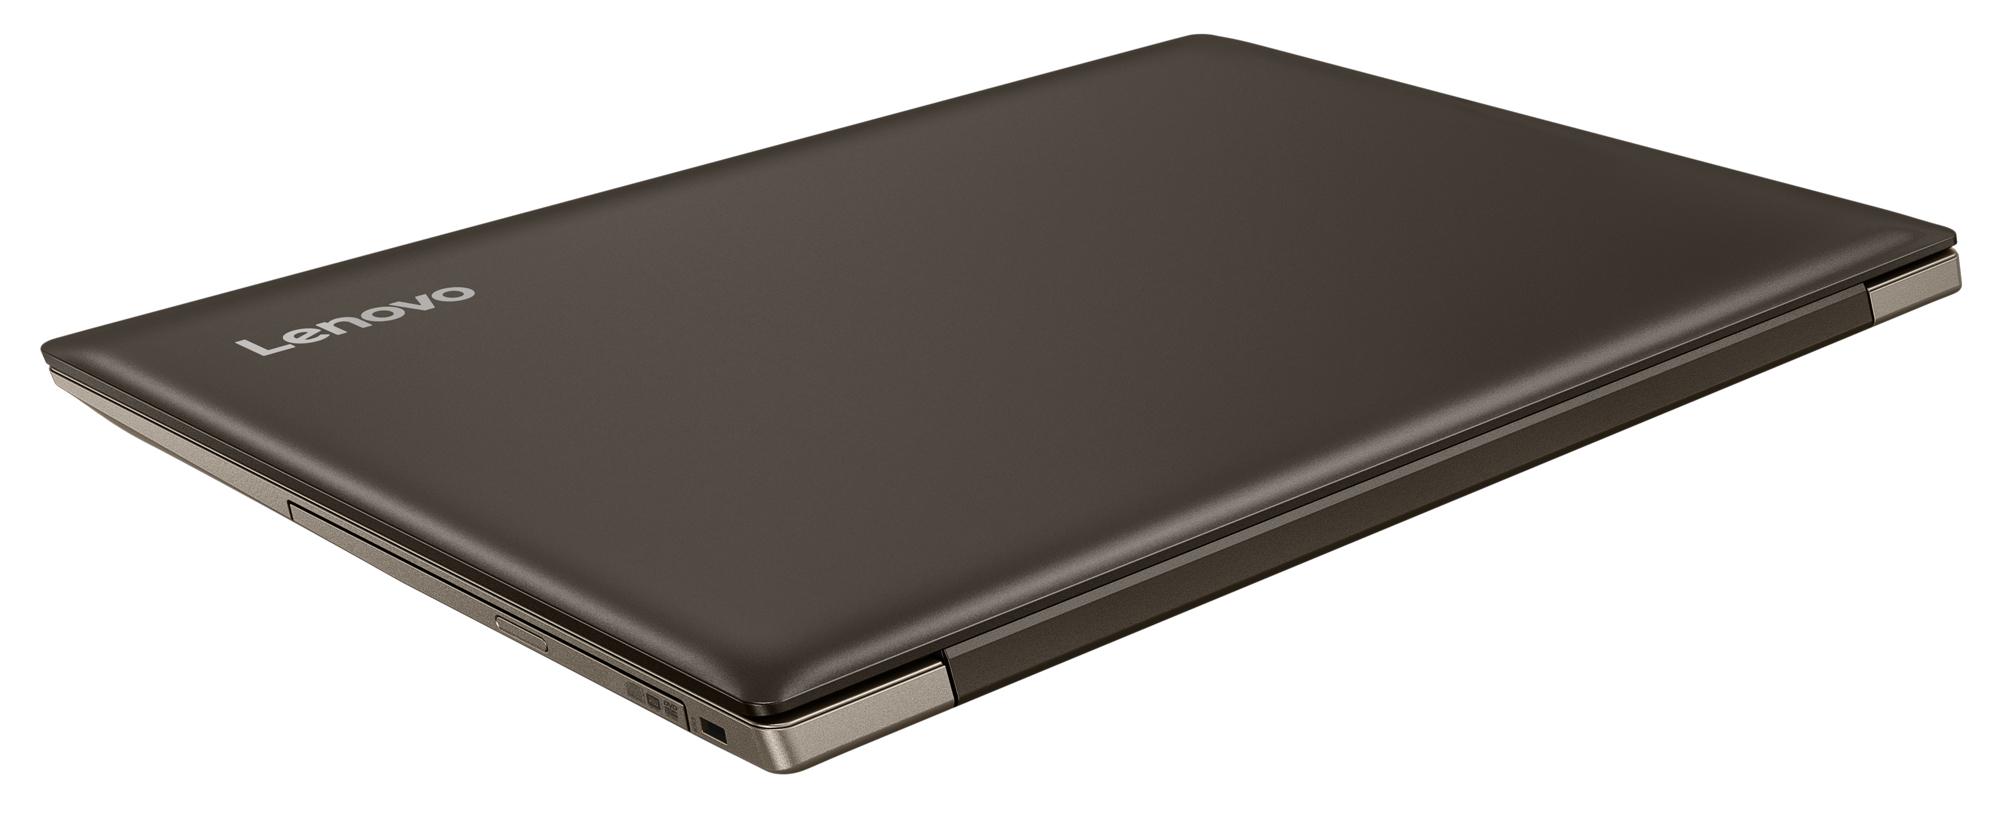 Фото  Ноутбук Lenovo ideapad 330-15 Chocolate (81D100H6RA)